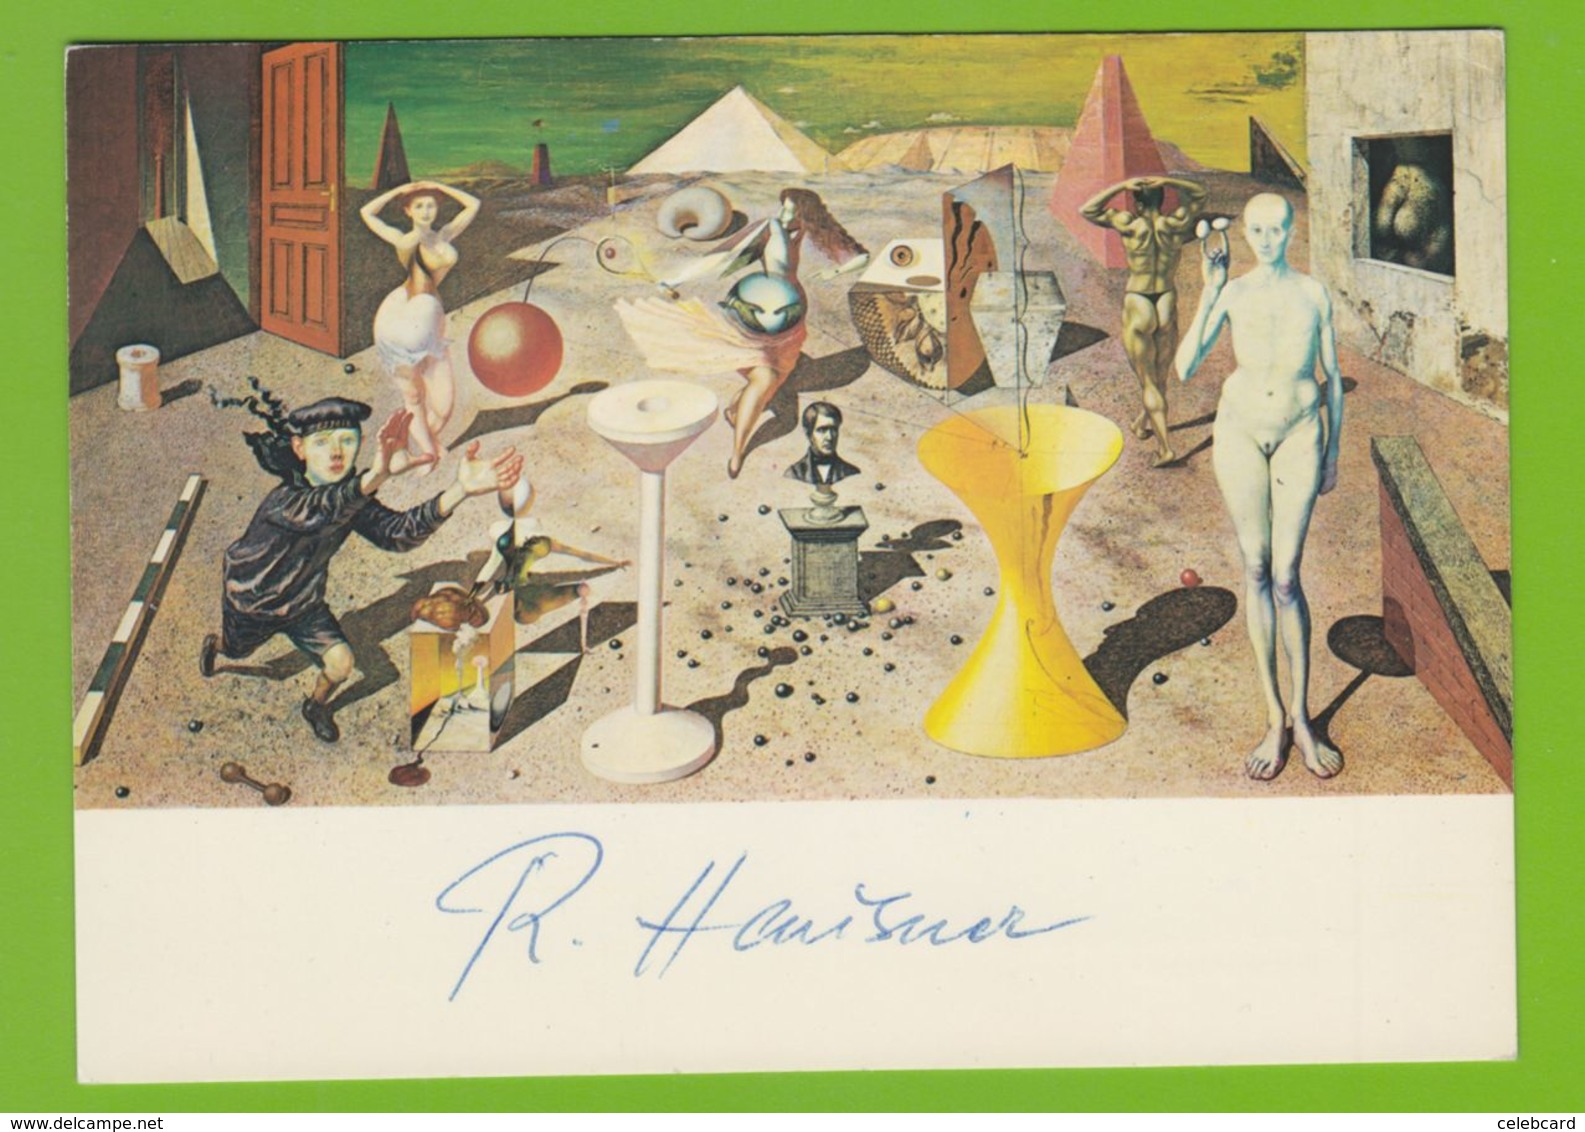 RUDOLF HAUSNER  AUTOGRAPH / AUTOGRAMM  Art Postcard 10/15 Cm - Autographs